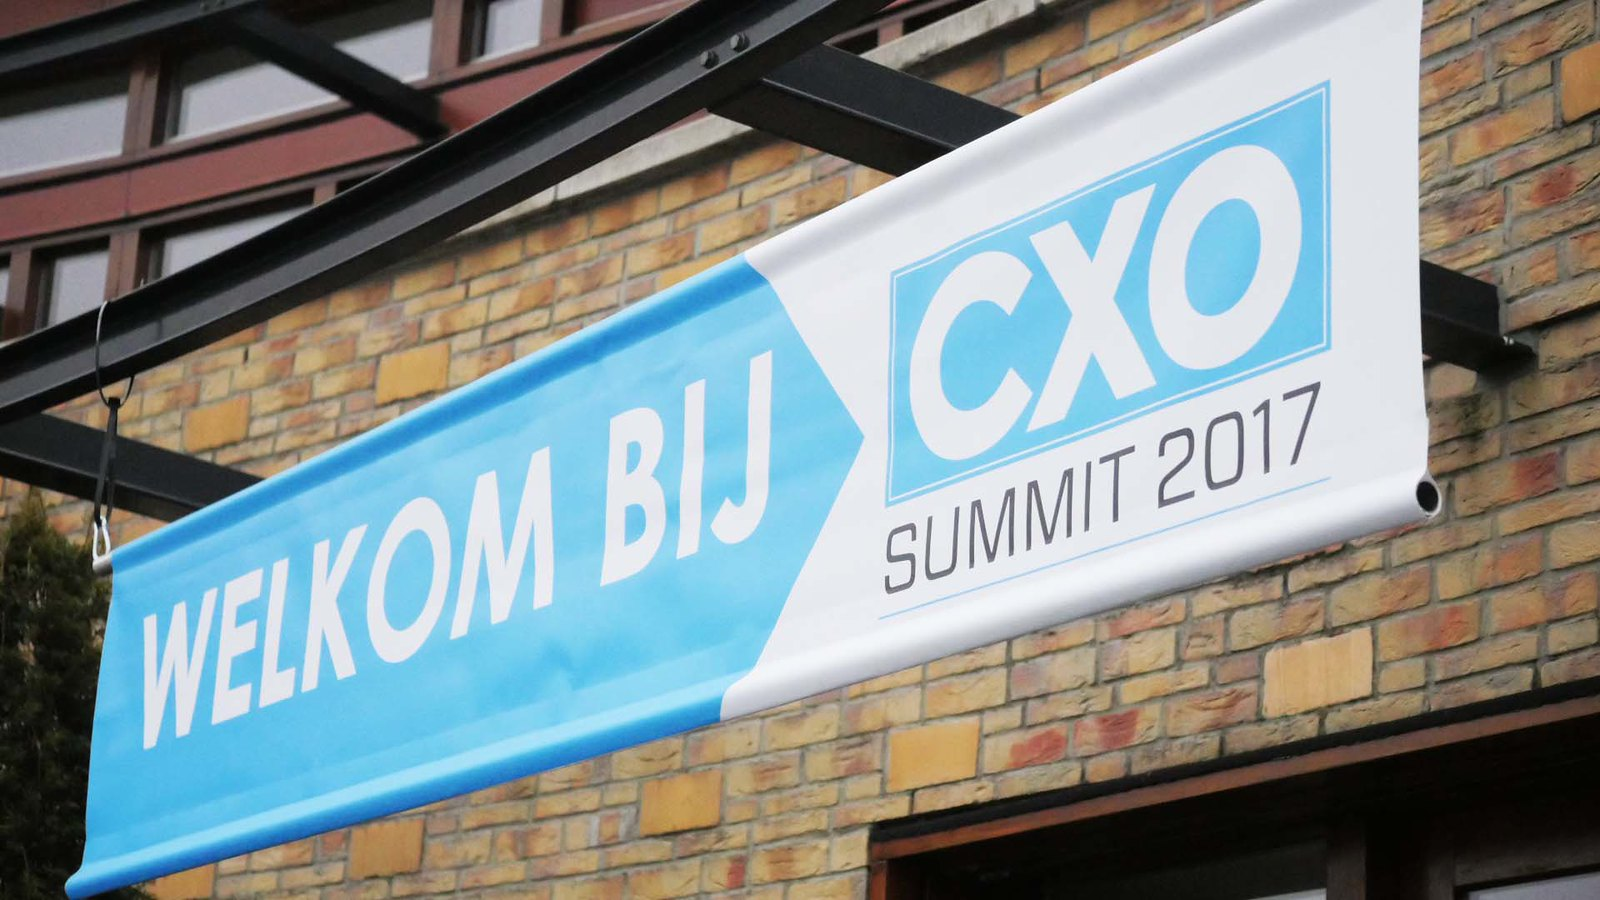 CXO Summit 2017